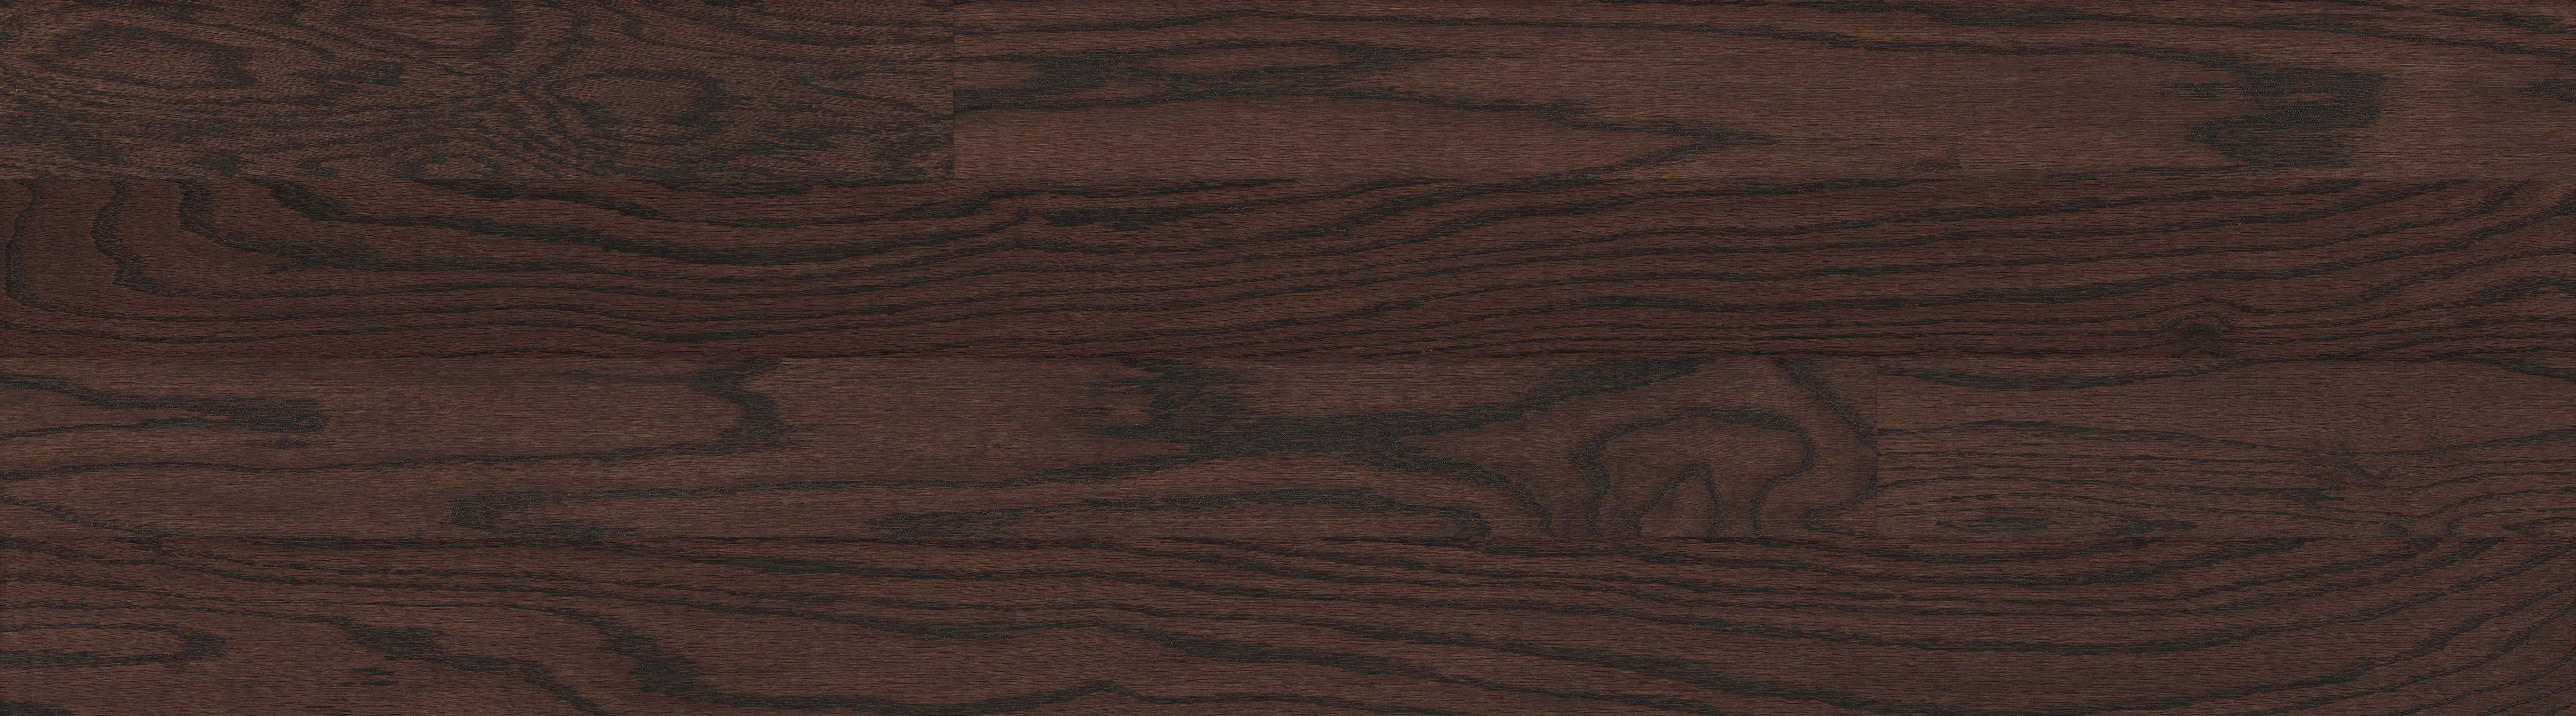 Engineered Hardwood Flooring Reviews Of Mullican Ridgecrest Oak Burnt Umber 1 2 Thick 5 Wide Engineered Regarding Mullican Ridgecrest Oak Burnt Umber 1 2 Thick 5 Wide Engineered Hardwood Flooring